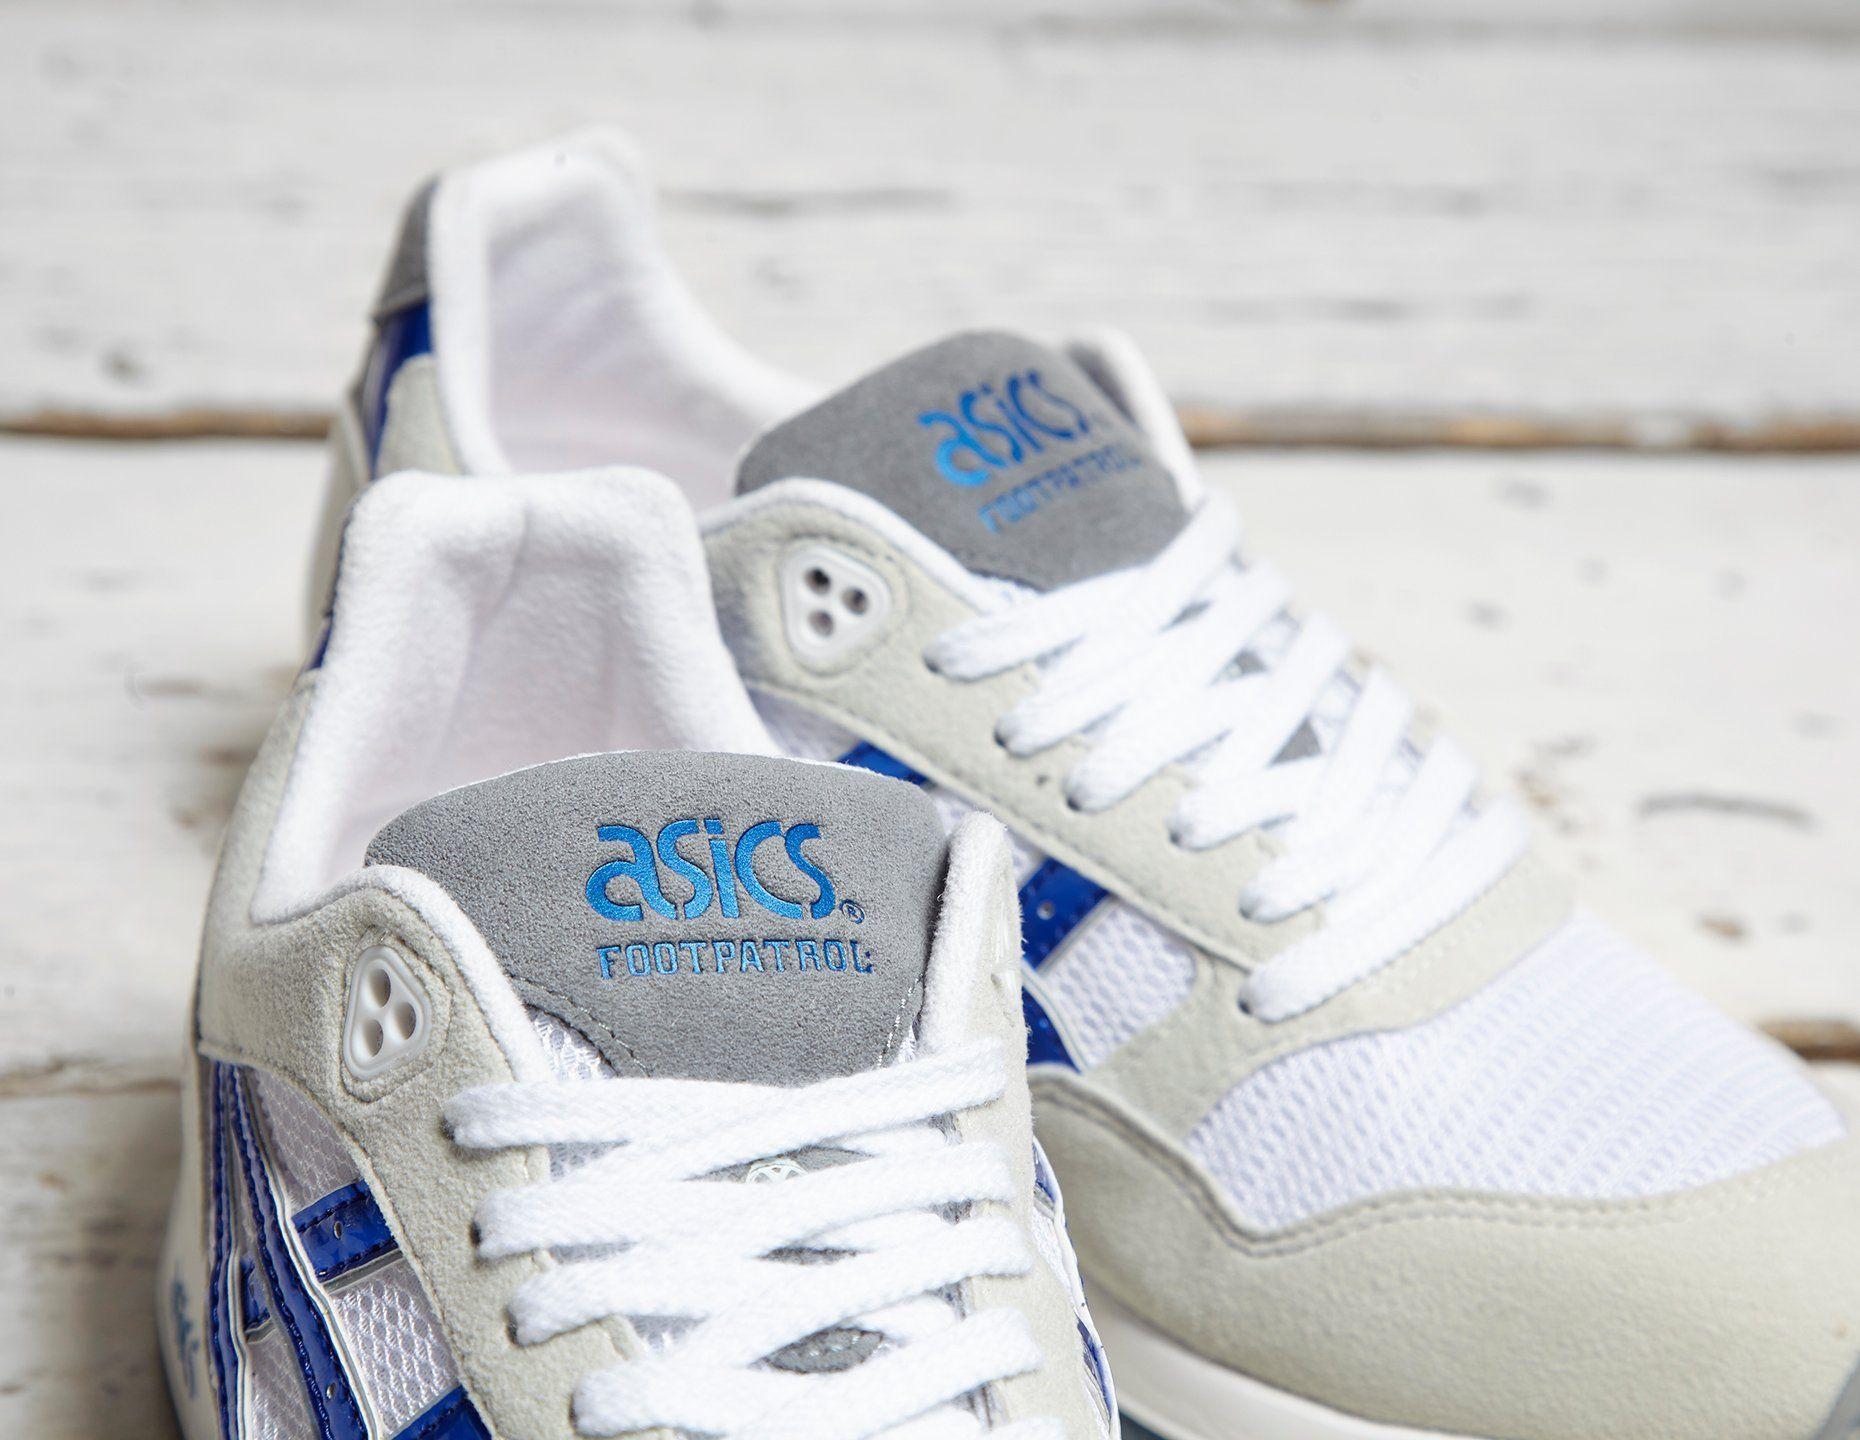 ASICS x Footpatrol GEL-SAGA Women's